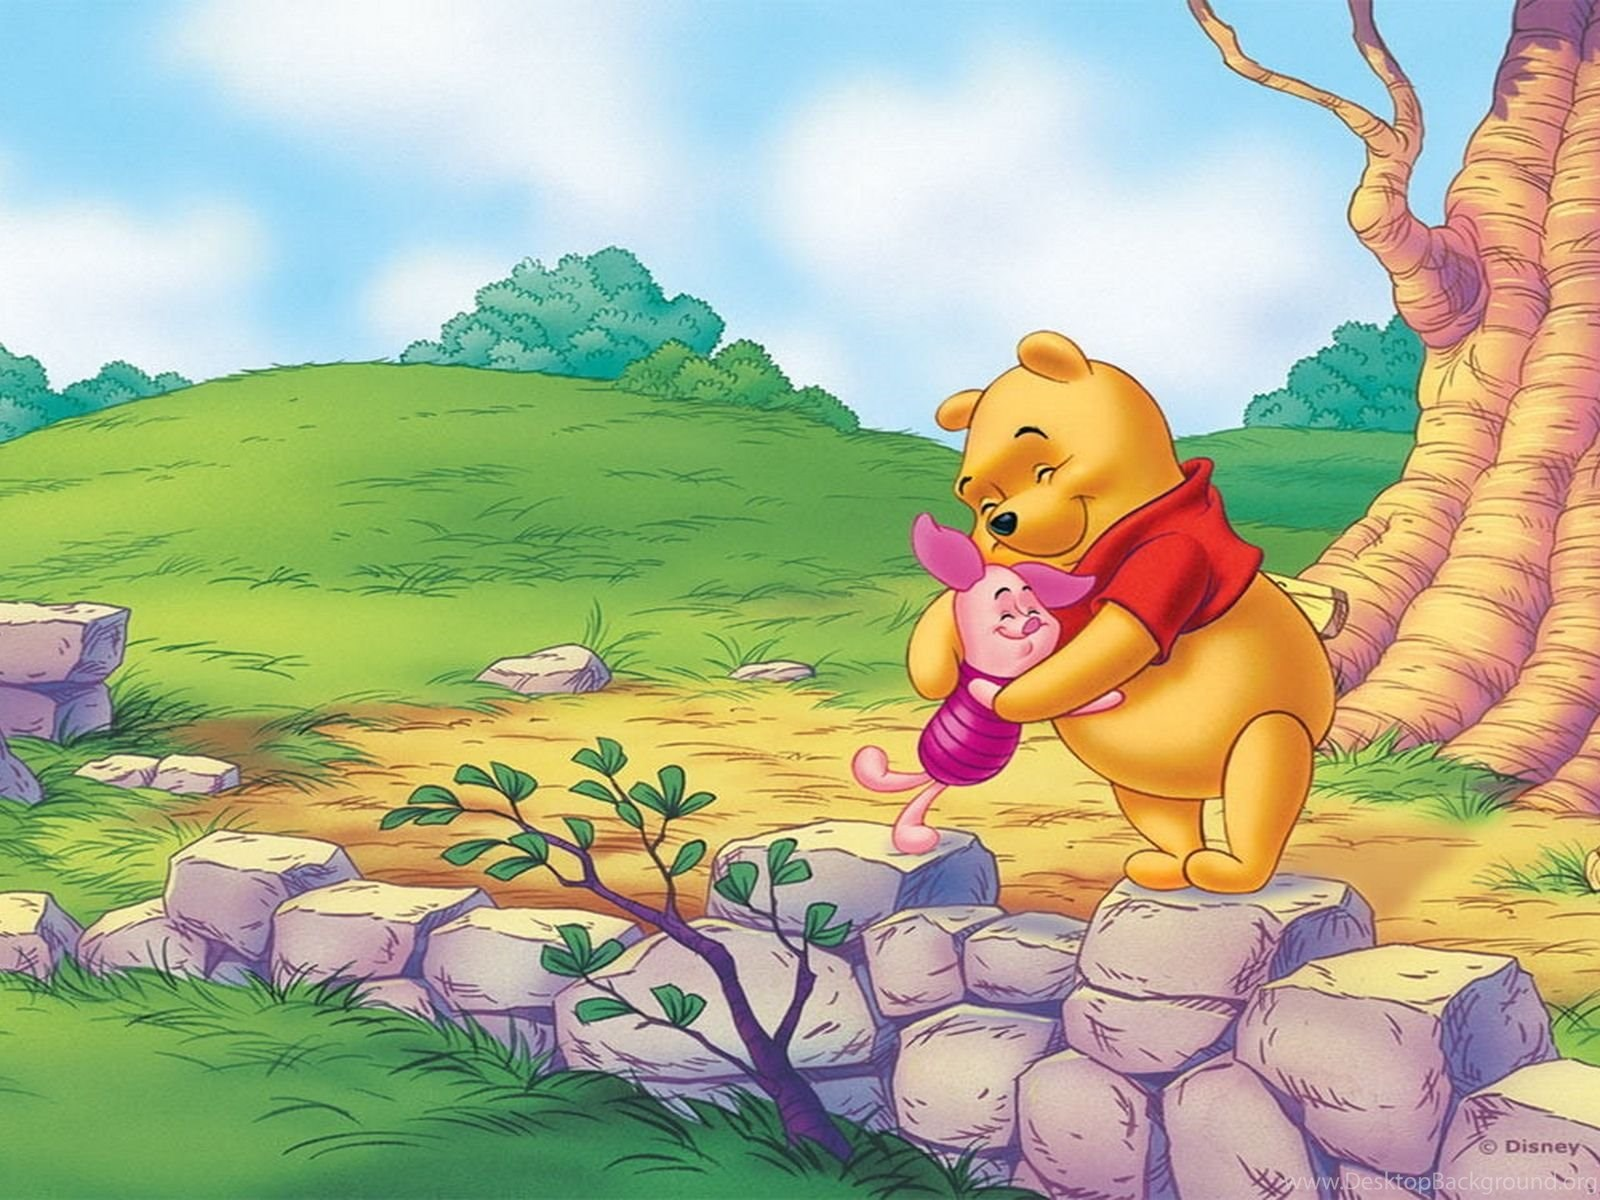 Winnie the pooh desktop images impremedia 1600x1200 1280x960 1024x768 source 100 winnie pooh wallpaper iphone 4 awesome winnie the pooh voltagebd Gallery